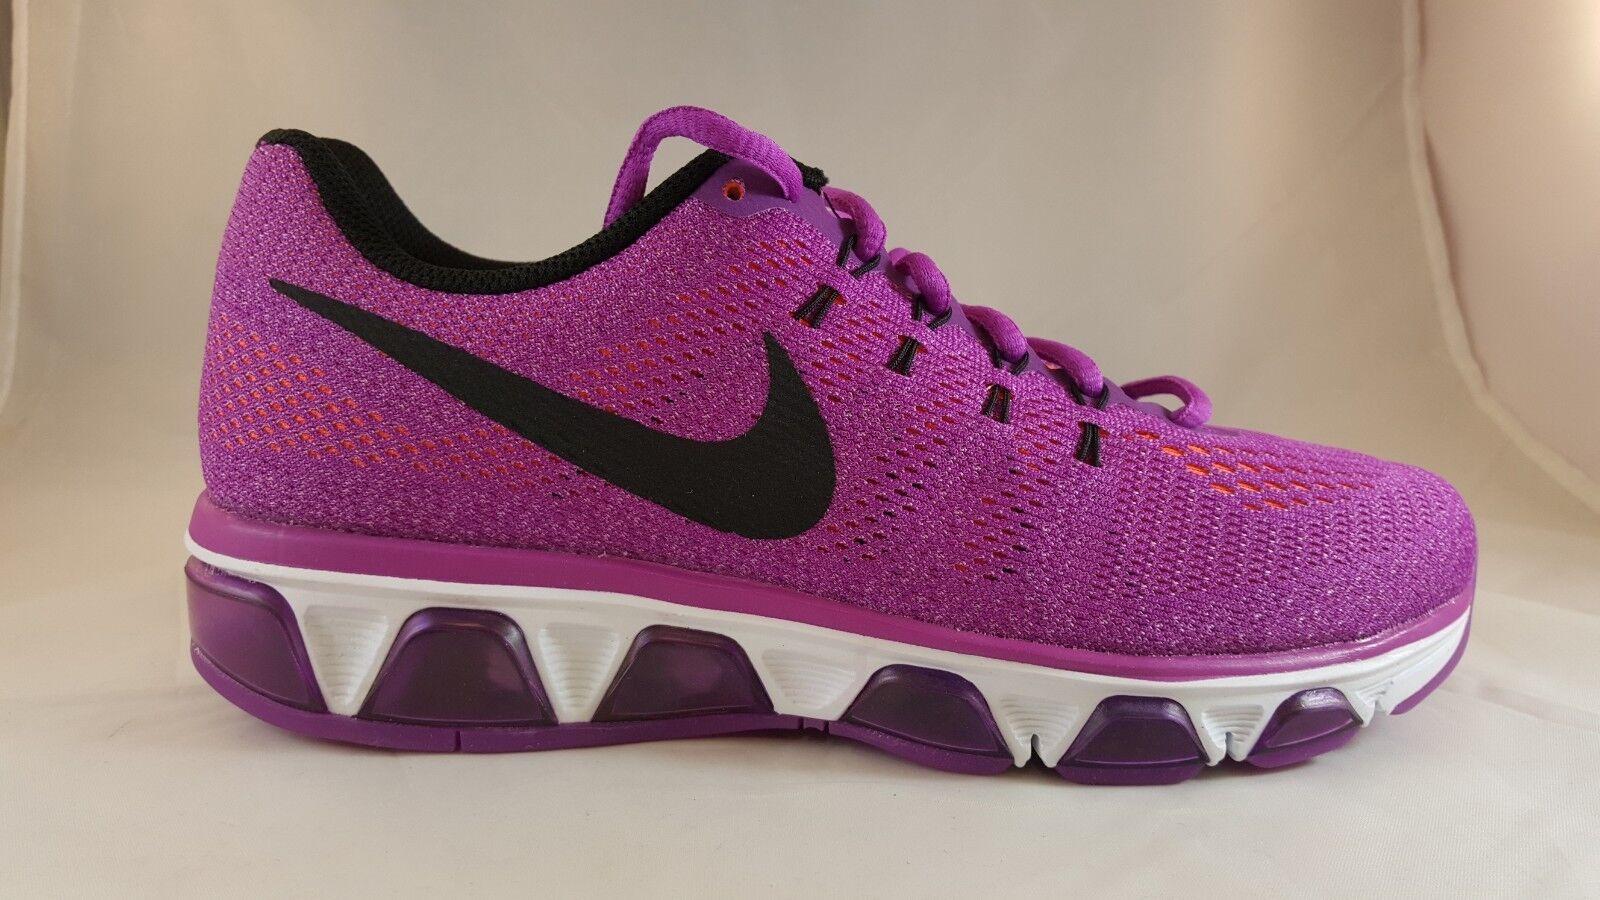 Nike Air Max Tailwind 8 Women's Running Shoe  805942 500 Size 8.5